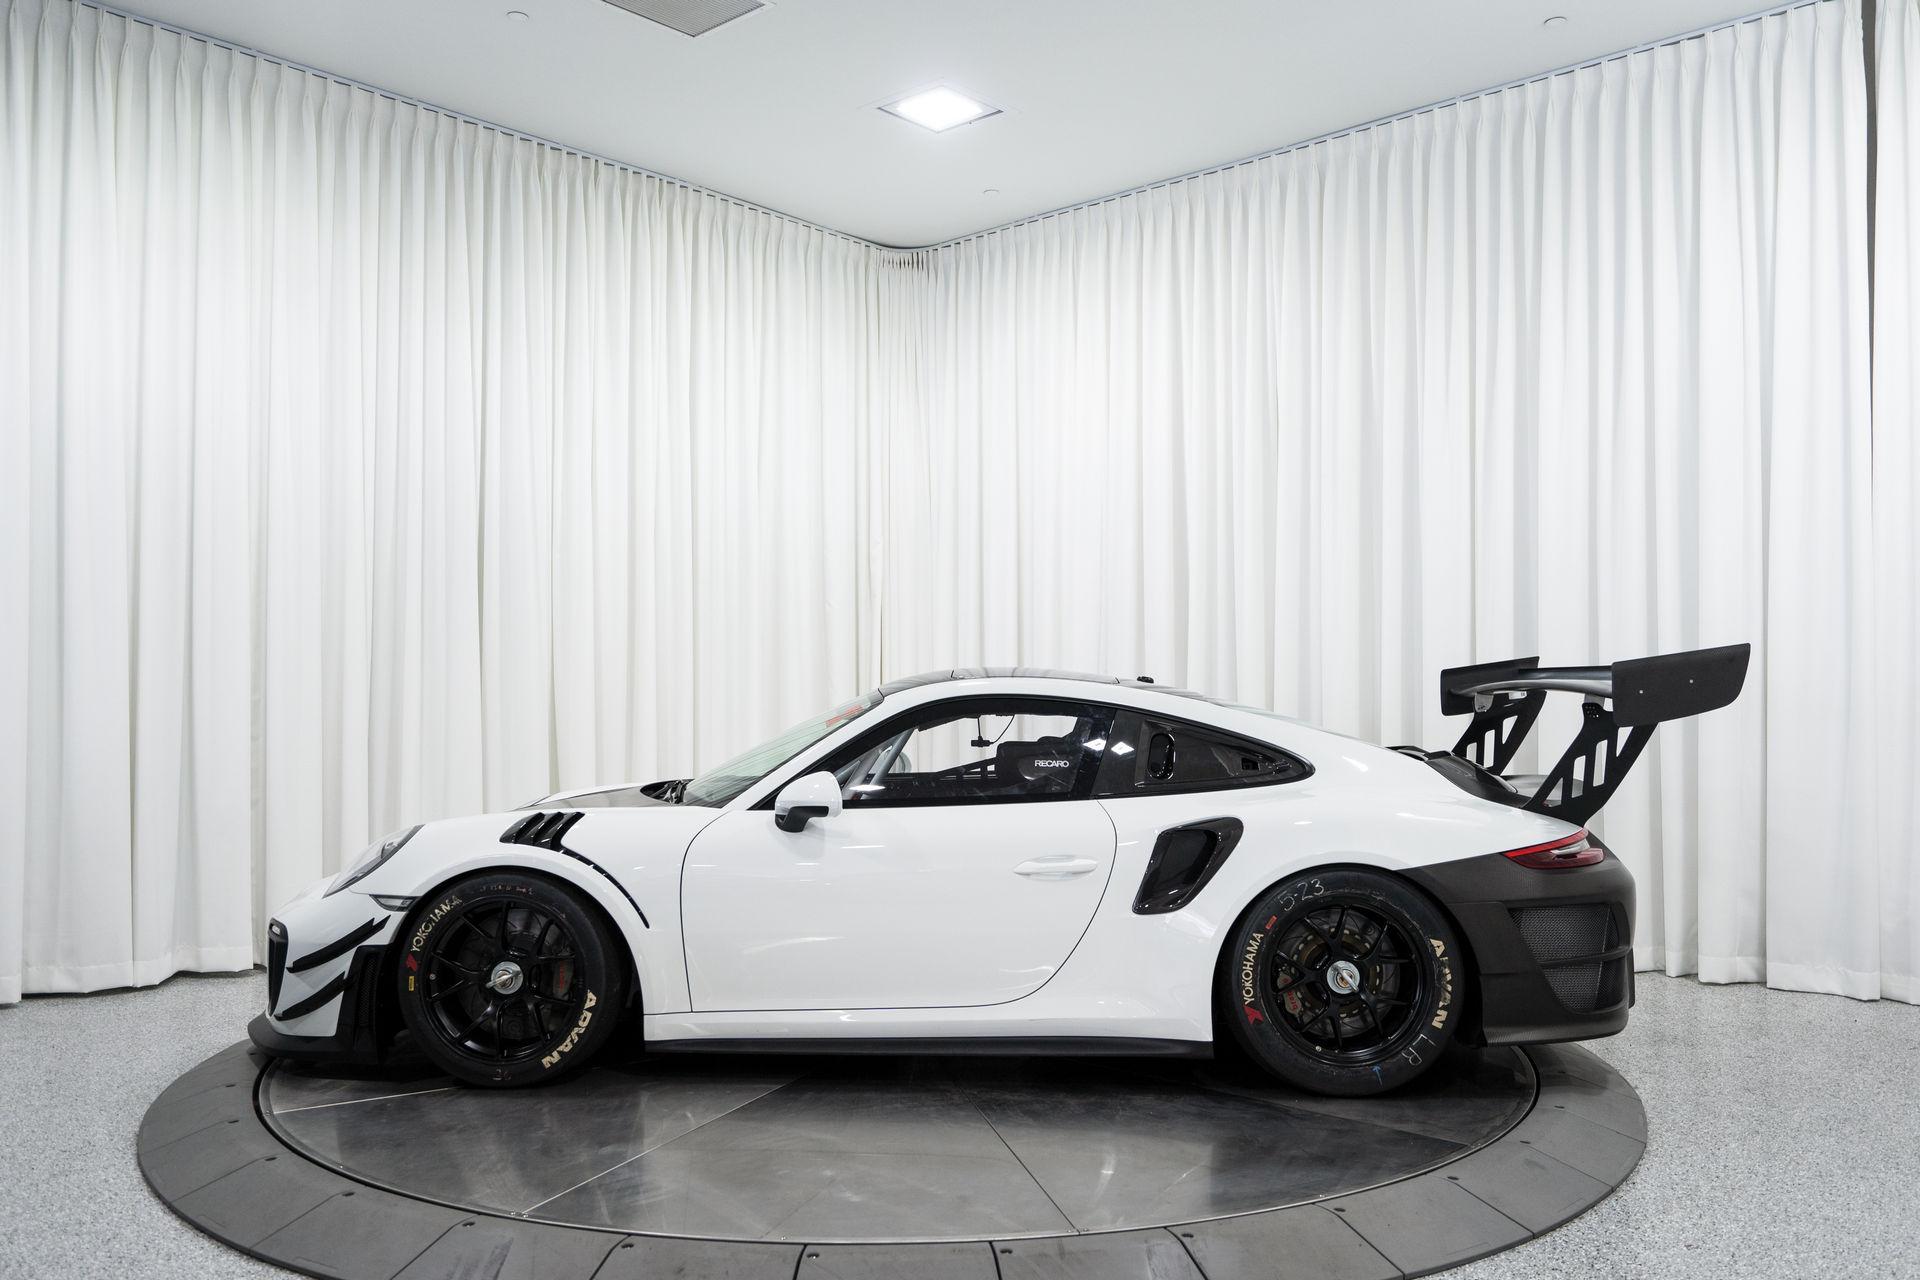 Porsche-911-GT2-RS-Clubsport-auction-8